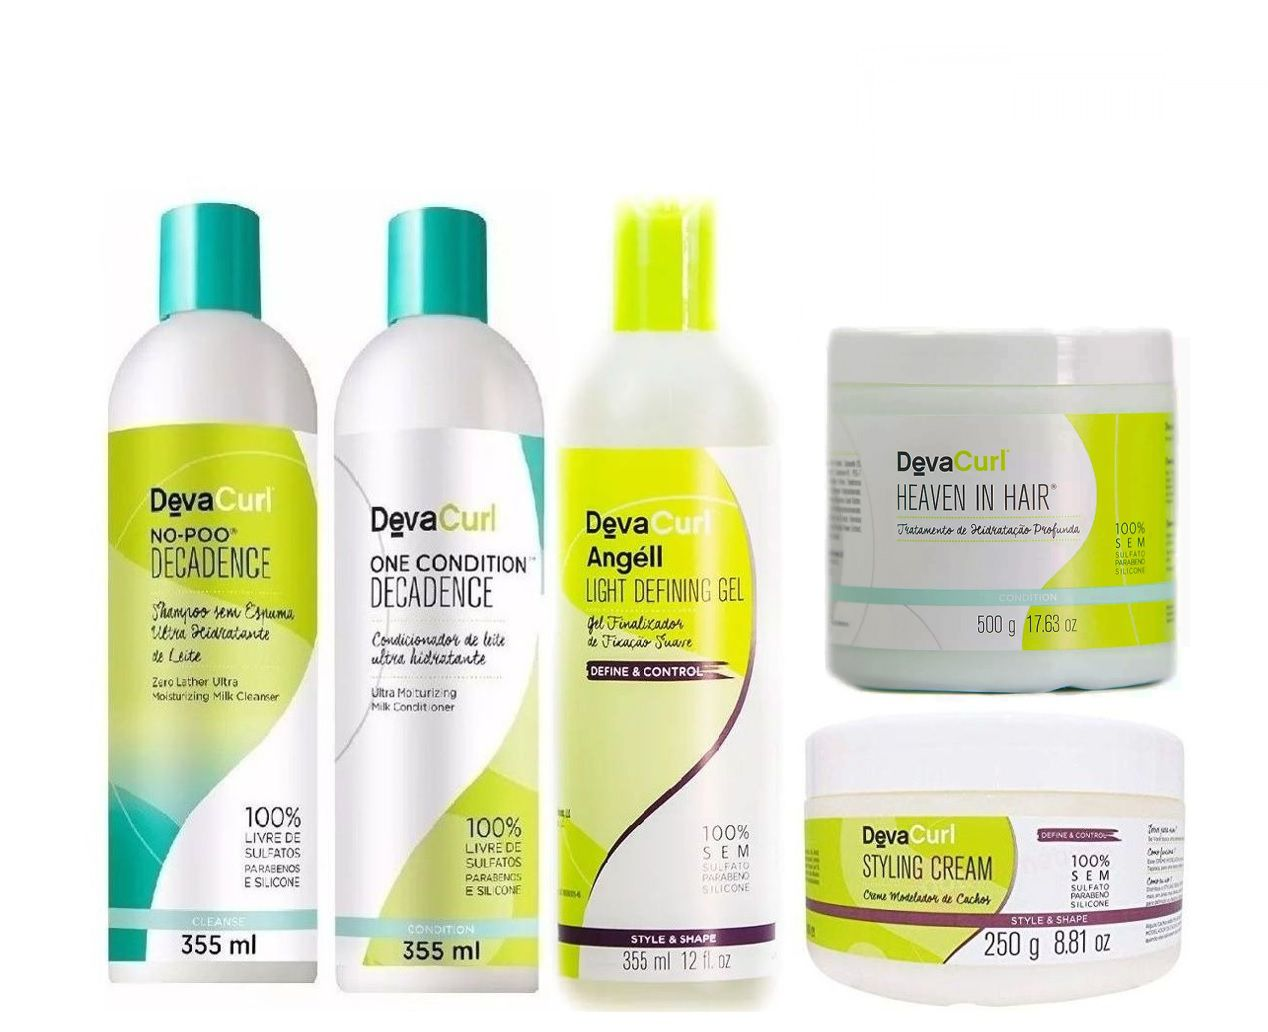 Kit Deva Curl Decadence Home Care ( 5 itens)